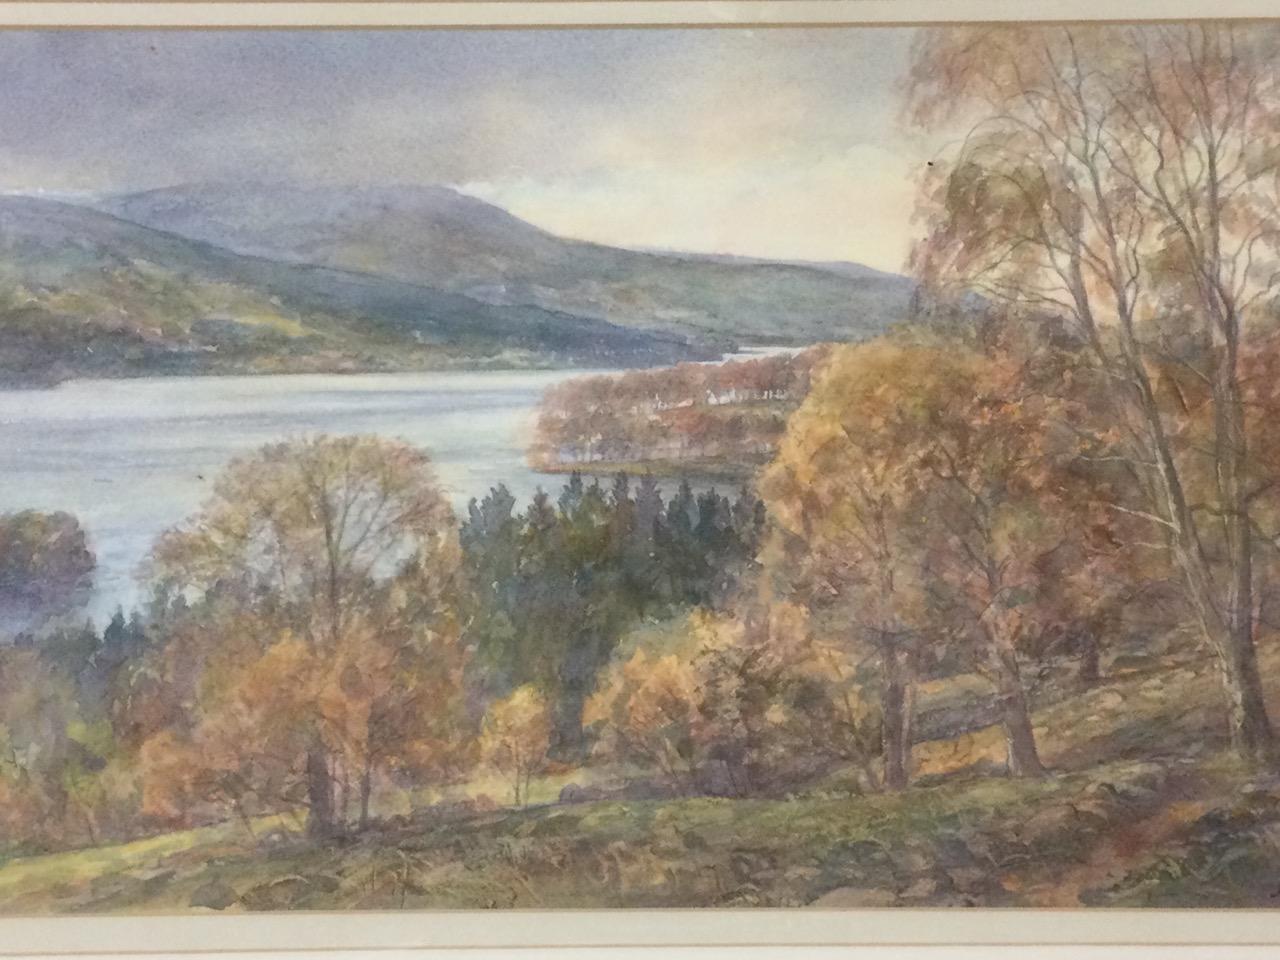 John Fisher, watercolour, Scottish landscape, inscribed to label verso Loch Tummel & Schiehallion, - Image 2 of 3